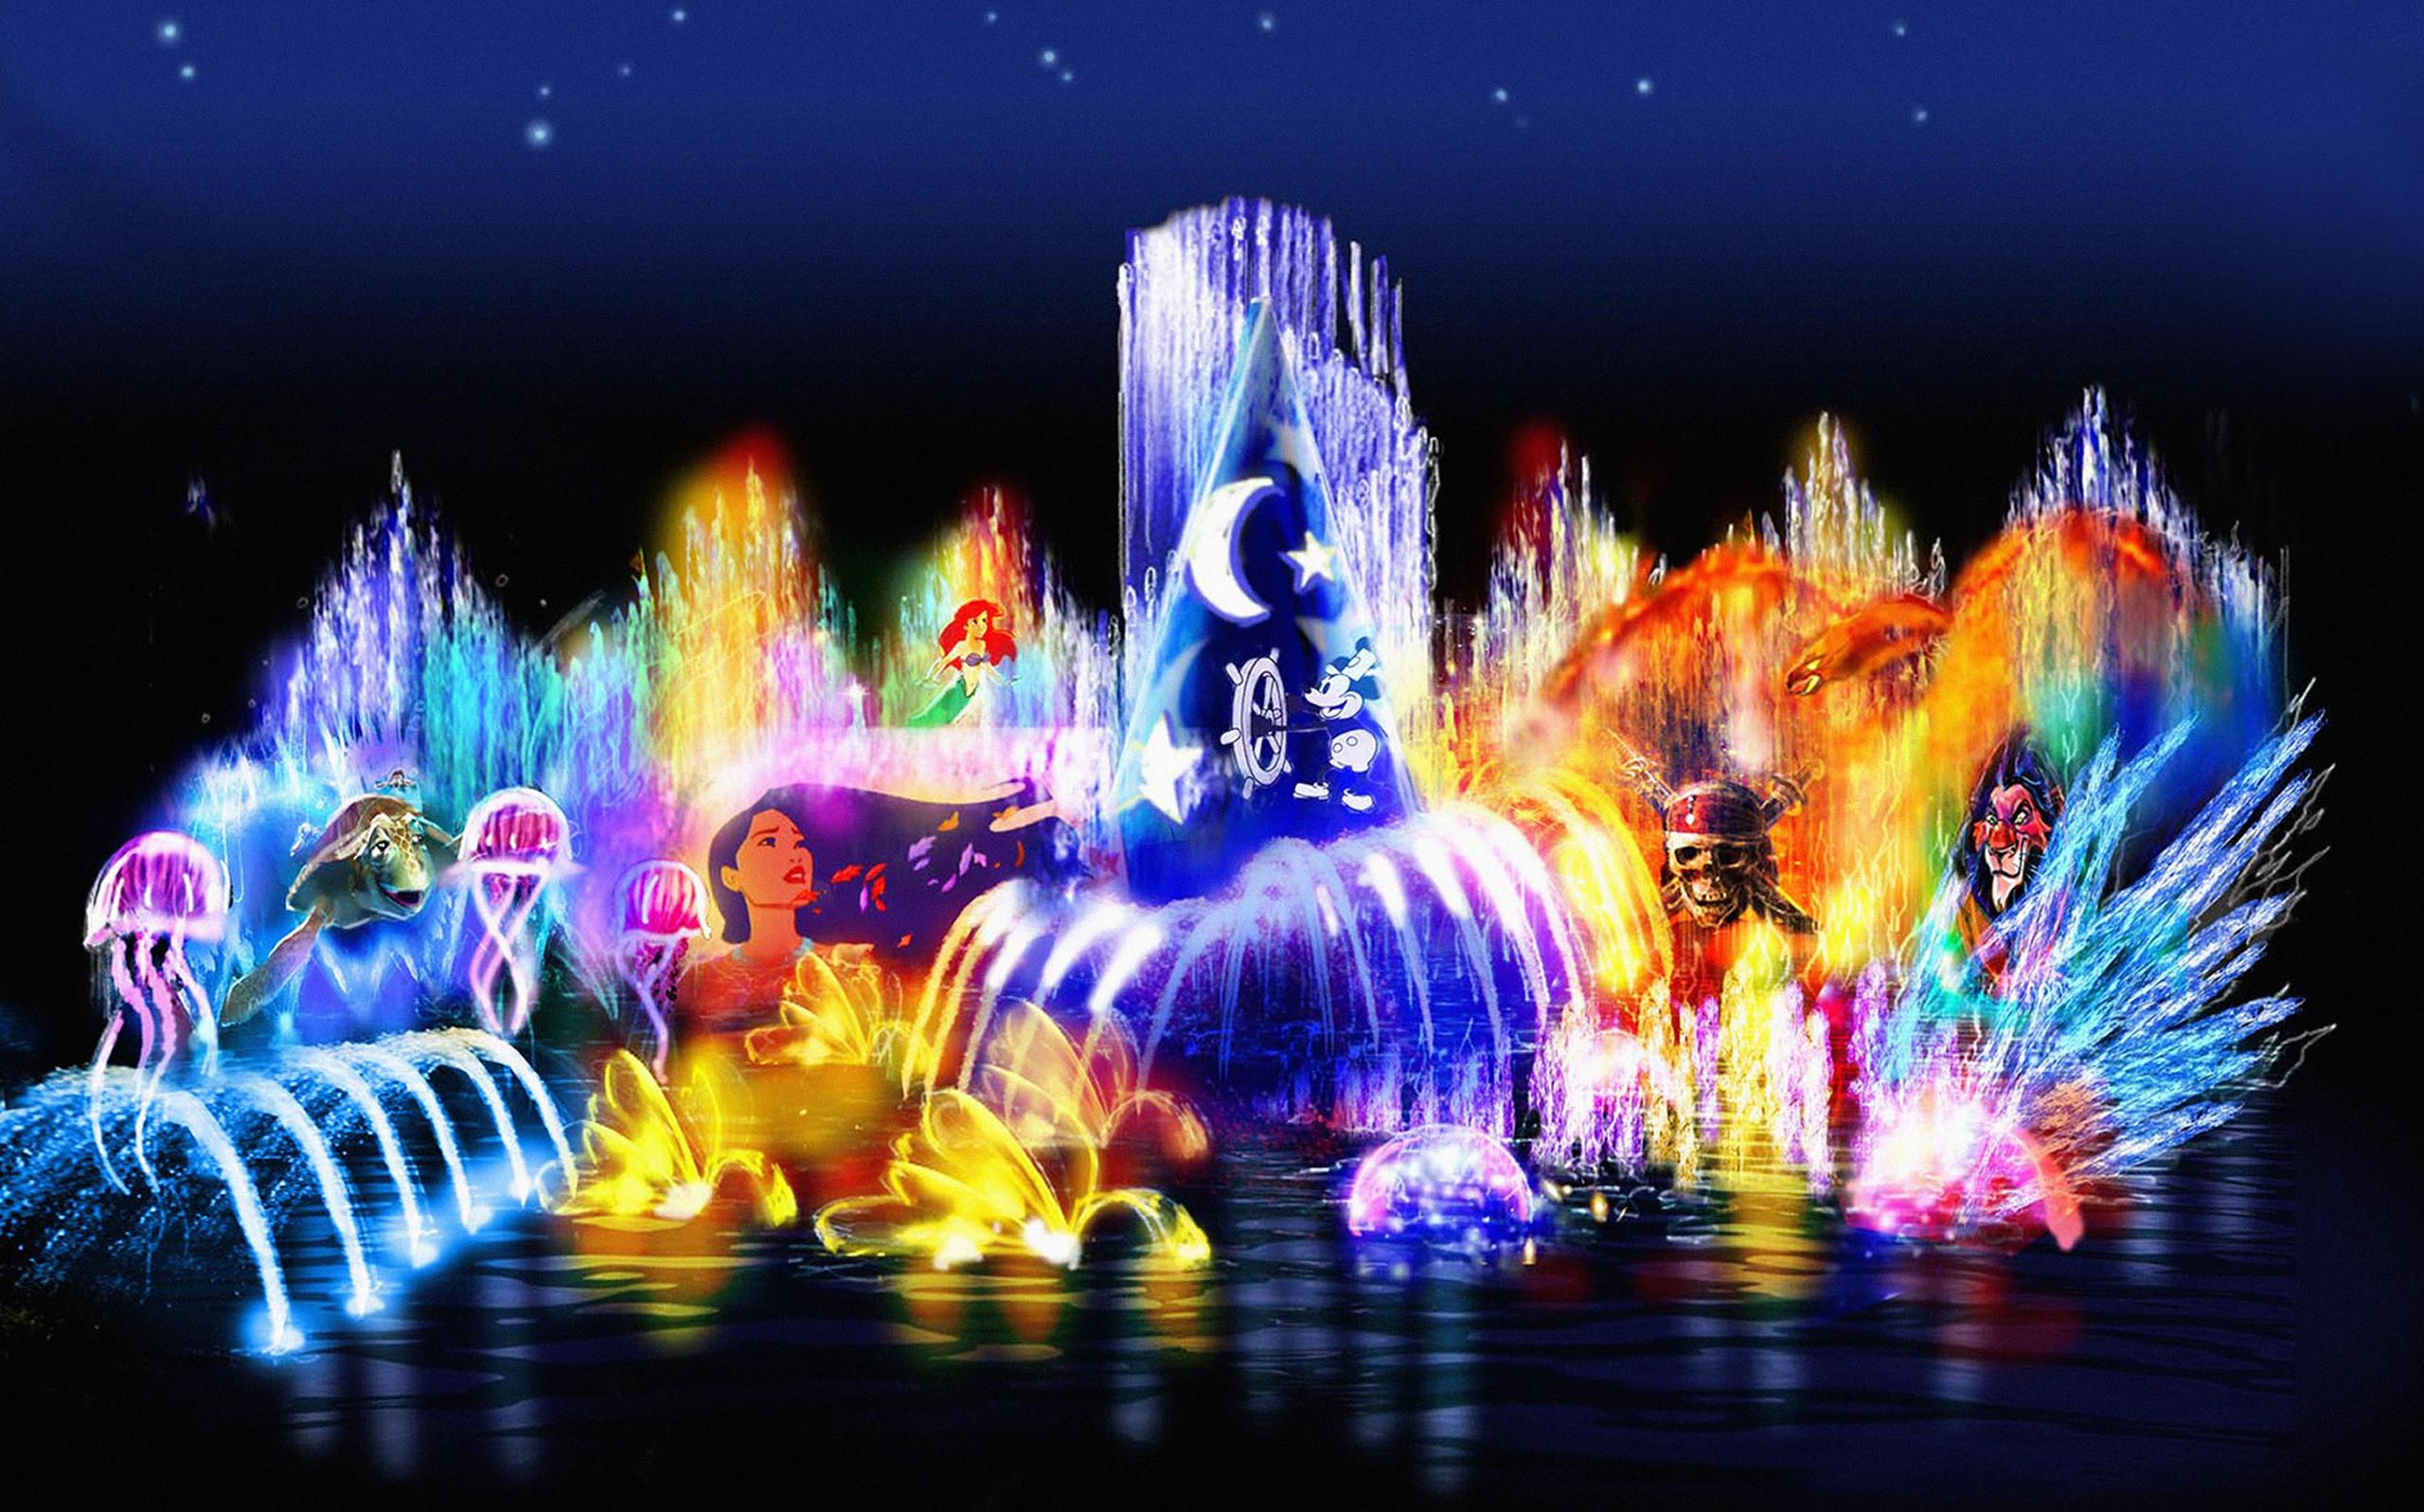 disney wallpaper Disney Characters Wallpaper 2560x1597